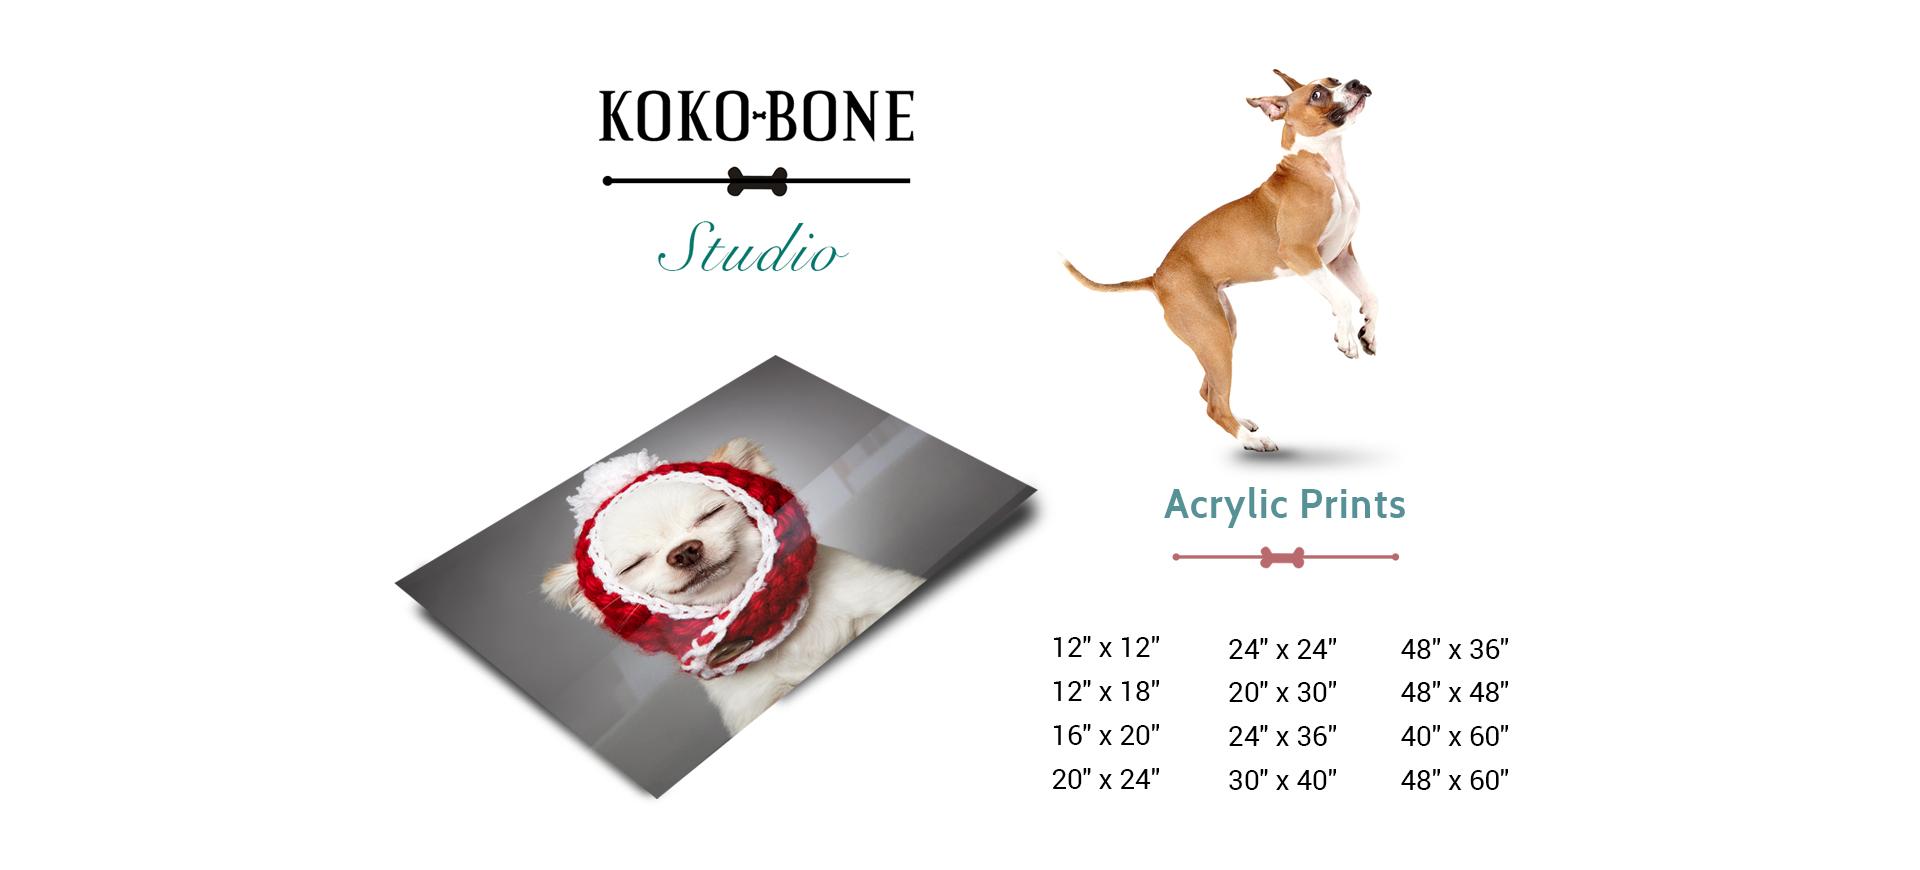 kokobone_acrylicprinting_slider1